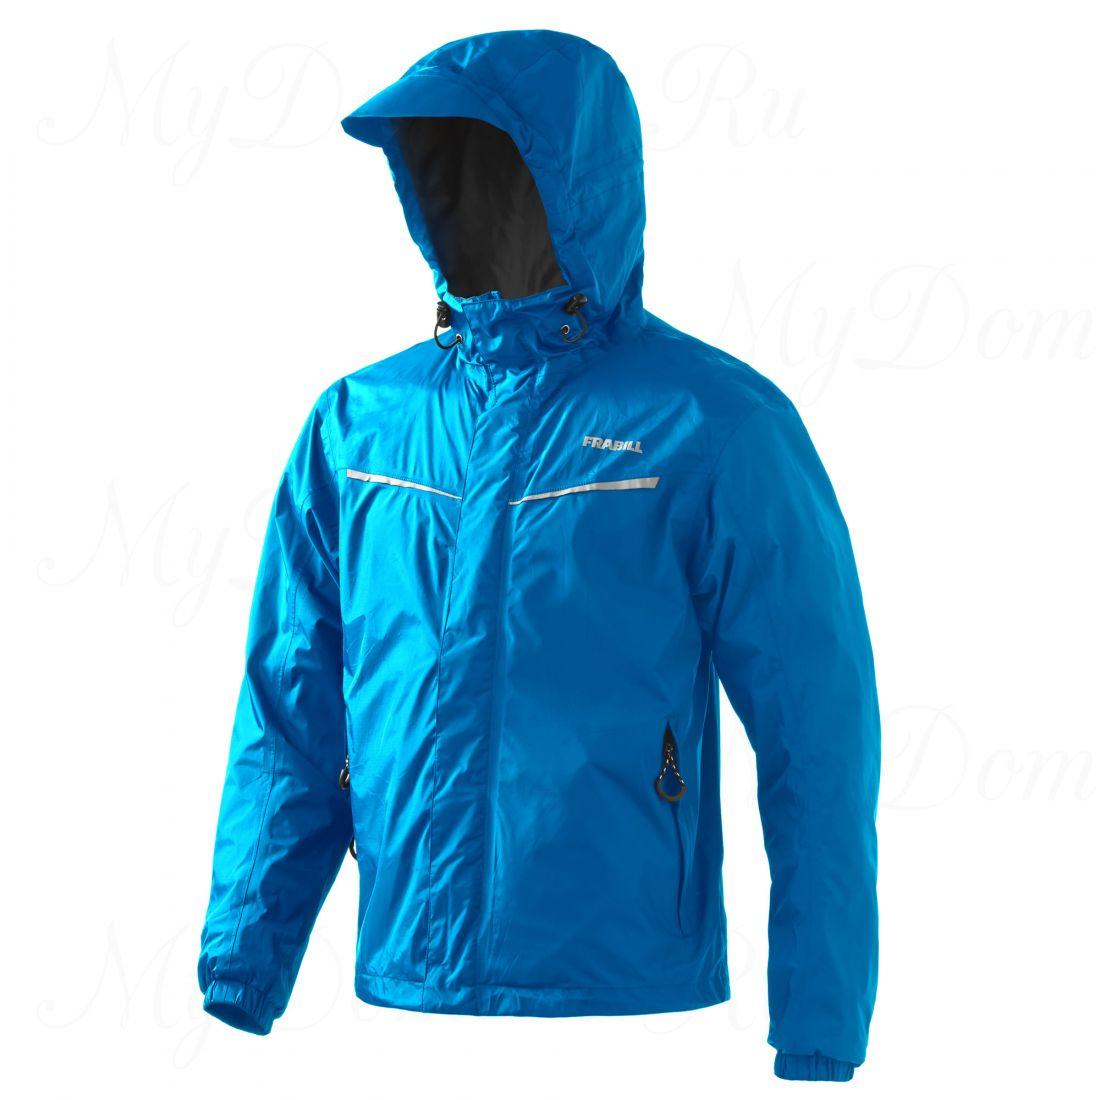 Куртка штормовая FRABILL Stow Jacket Costal Blue, р. M